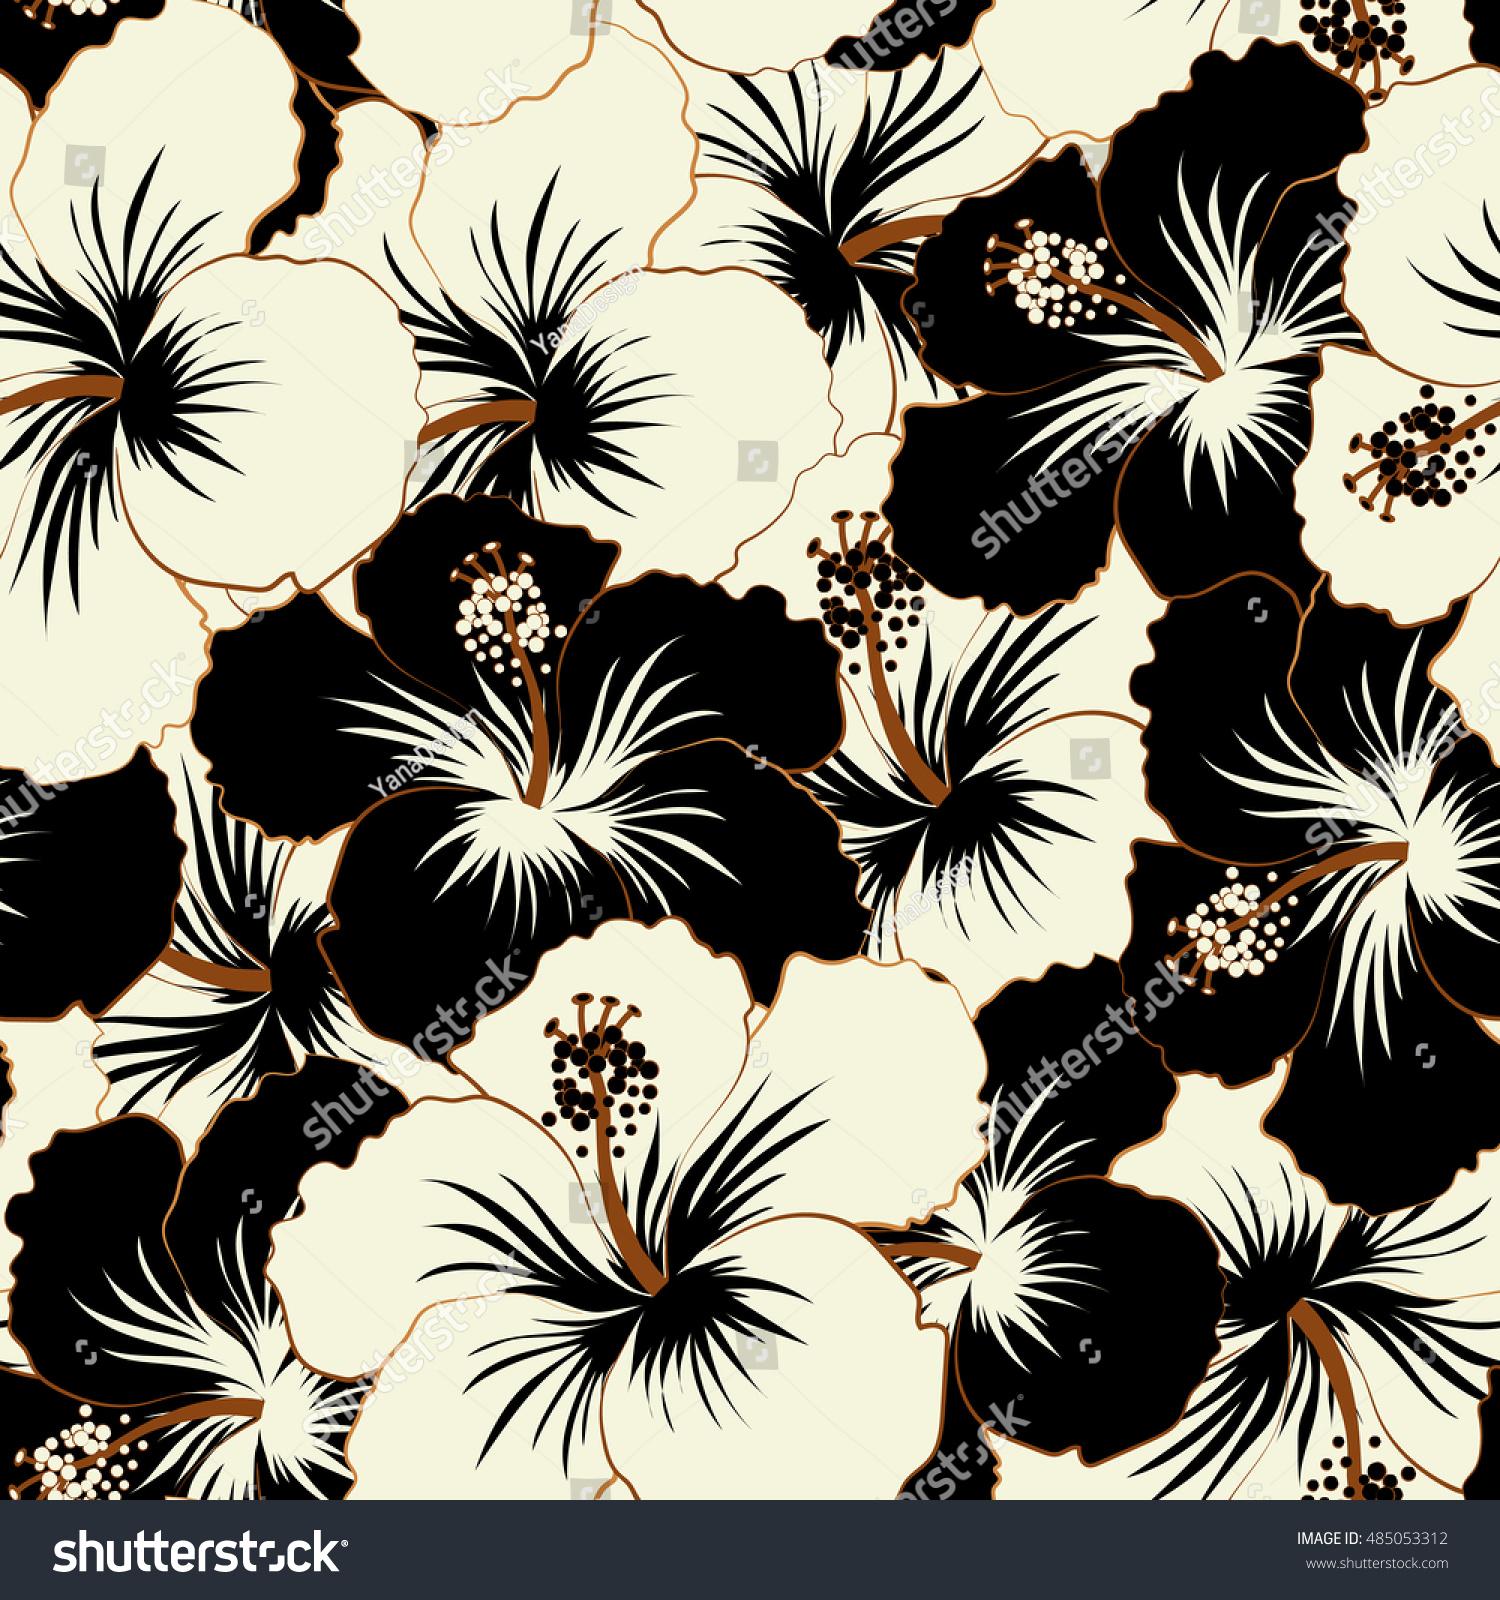 Hibiscus flowers and buds retro seamless pattern illustration in hibiscus flowers and buds retro seamless pattern illustration in black and white colors ez canvas izmirmasajfo